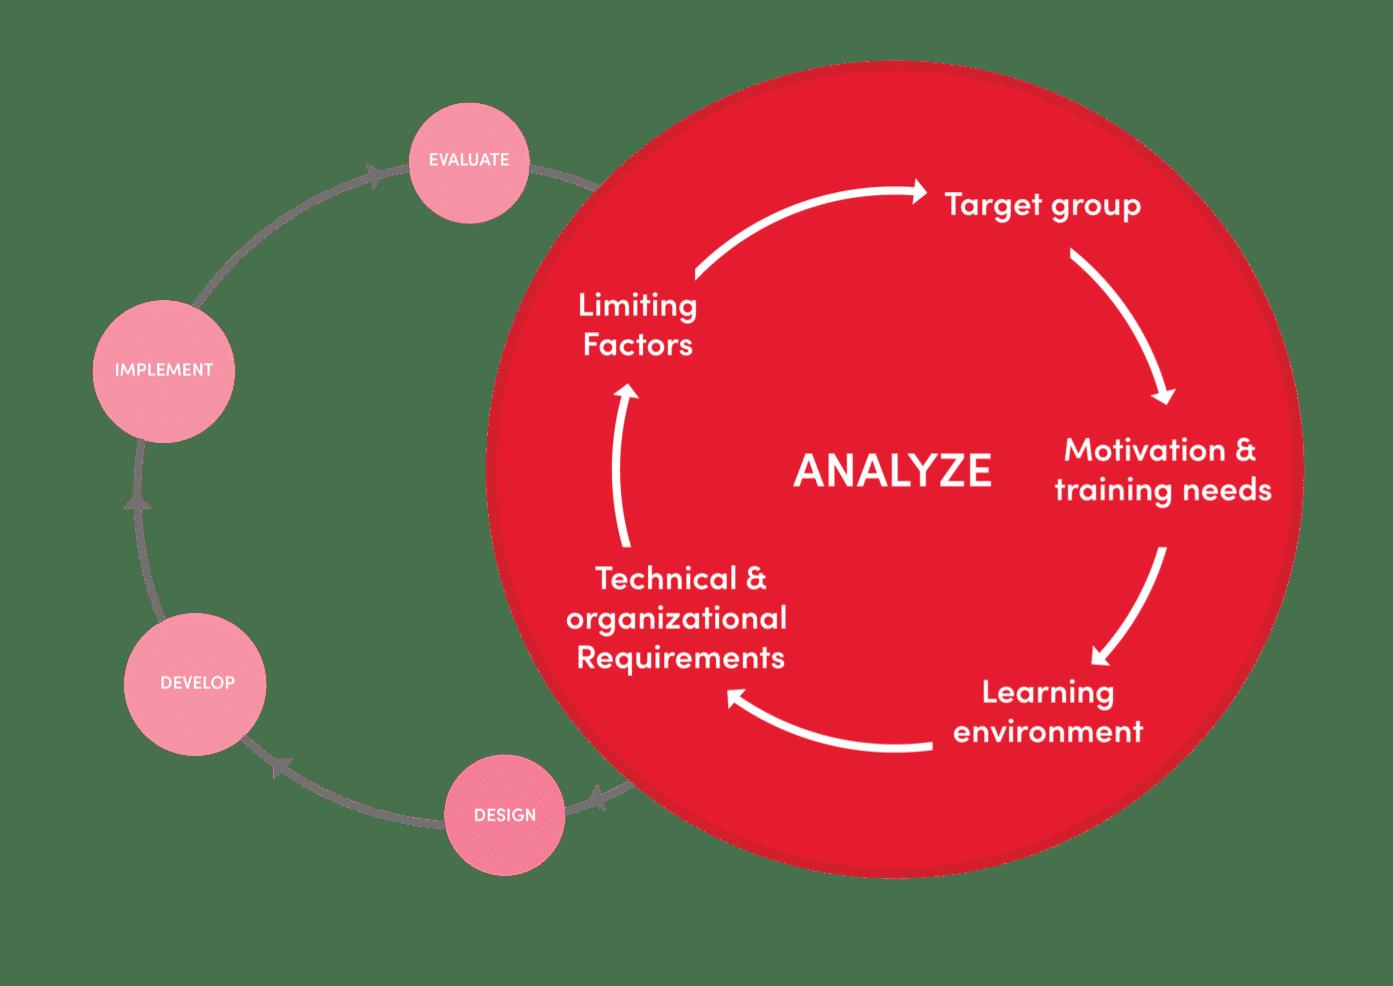 addie model phases